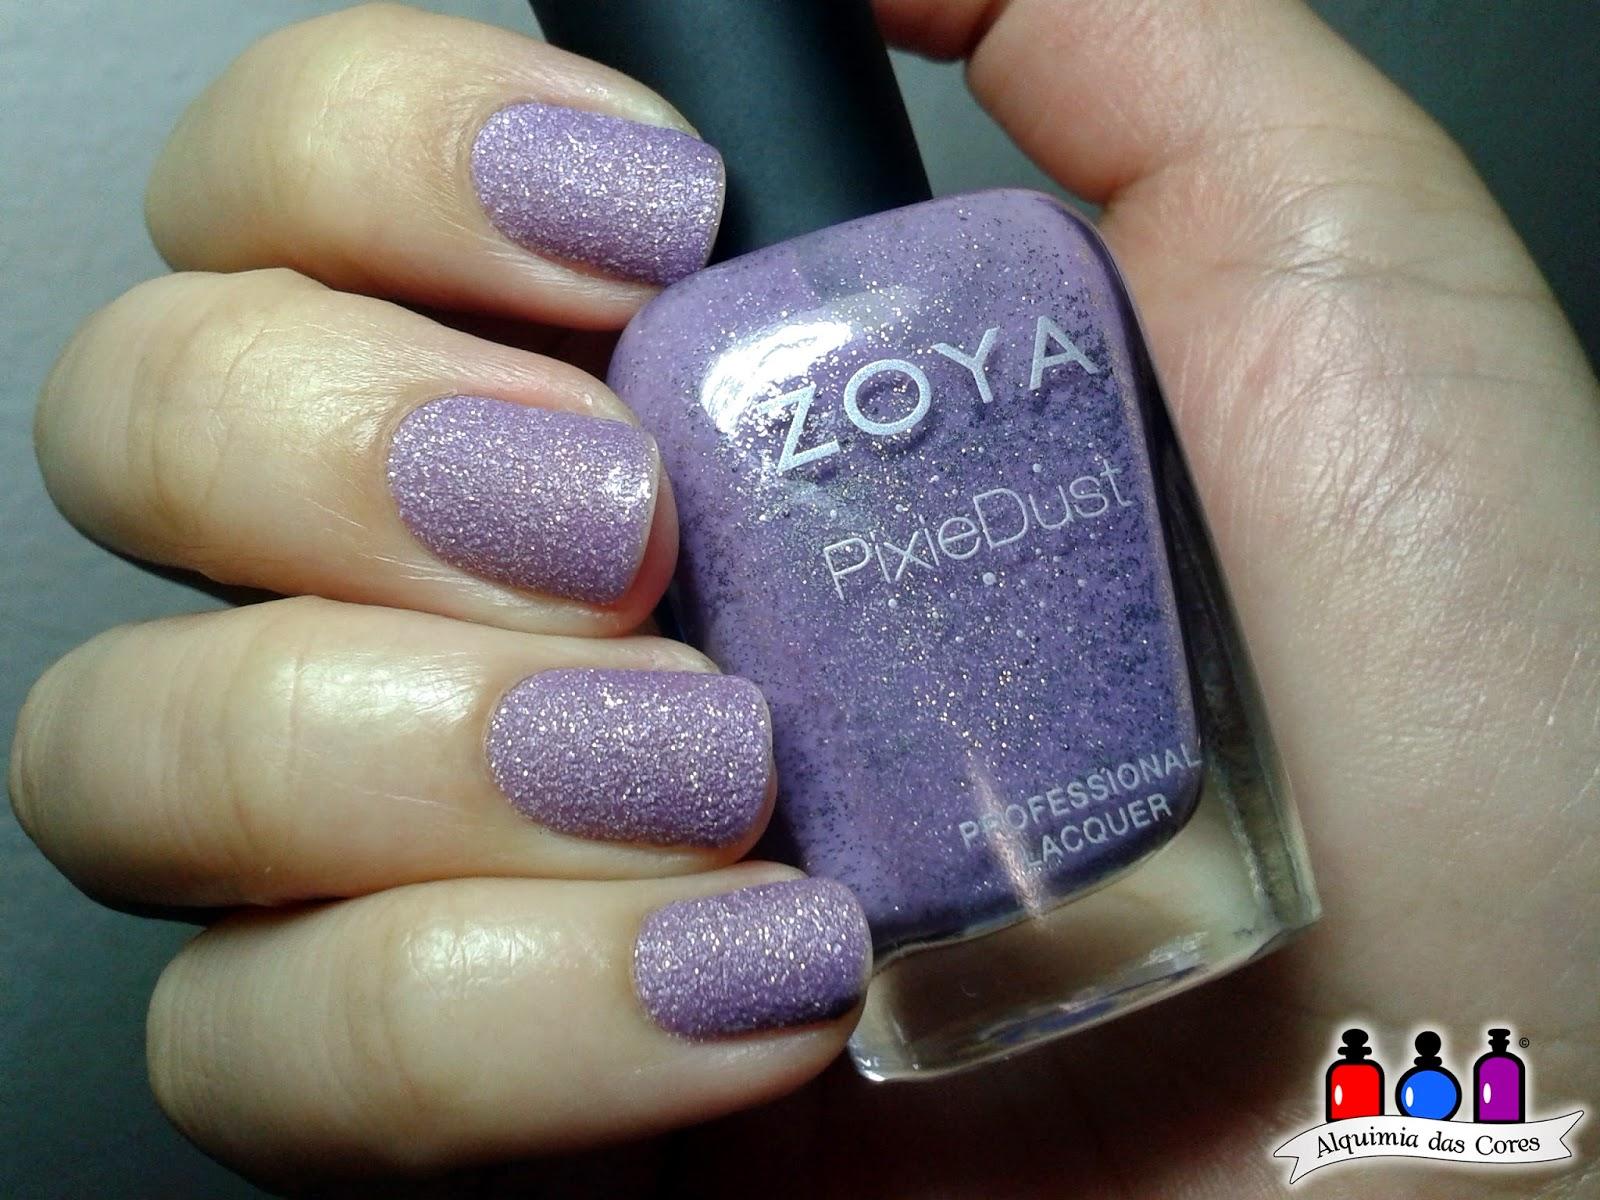 Zoya, texturizado, lilás, Stevie, nail polish, esmalte, Pixie Dust